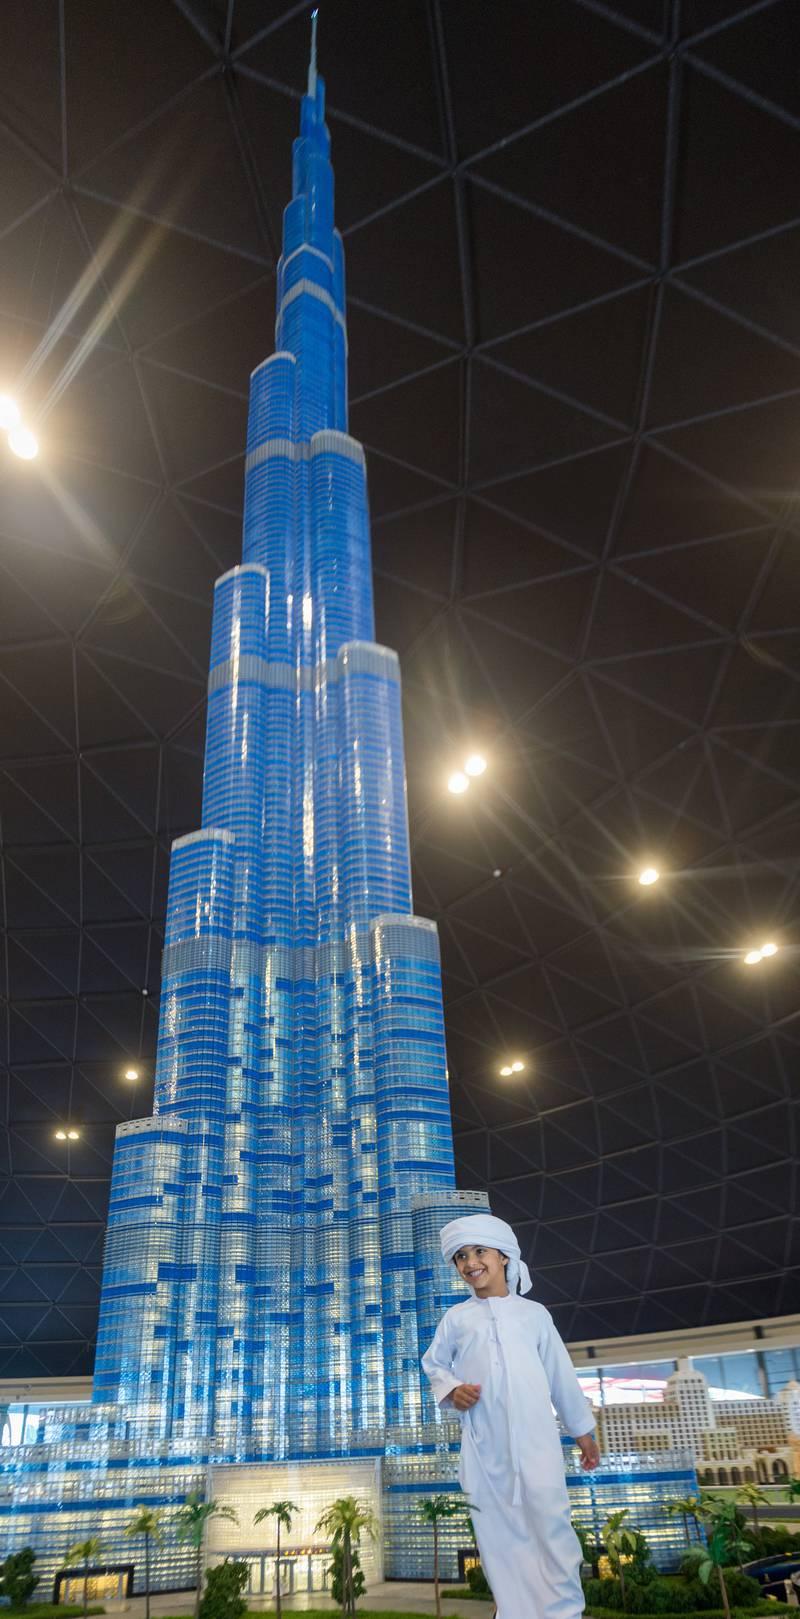 Dubai, UAE: 17 October, 2016 ö LEGOLAND¨ Dubai welcomed special guest, beloved Emirati youth Mohammed bin Ahmed Jaber Al Harbi to officially unveil the worldâs tallest LEGO¨ building structure: Burj Khalifa in MINILAND.  *** Local Caption ***  Al18-Legoland2.jpg